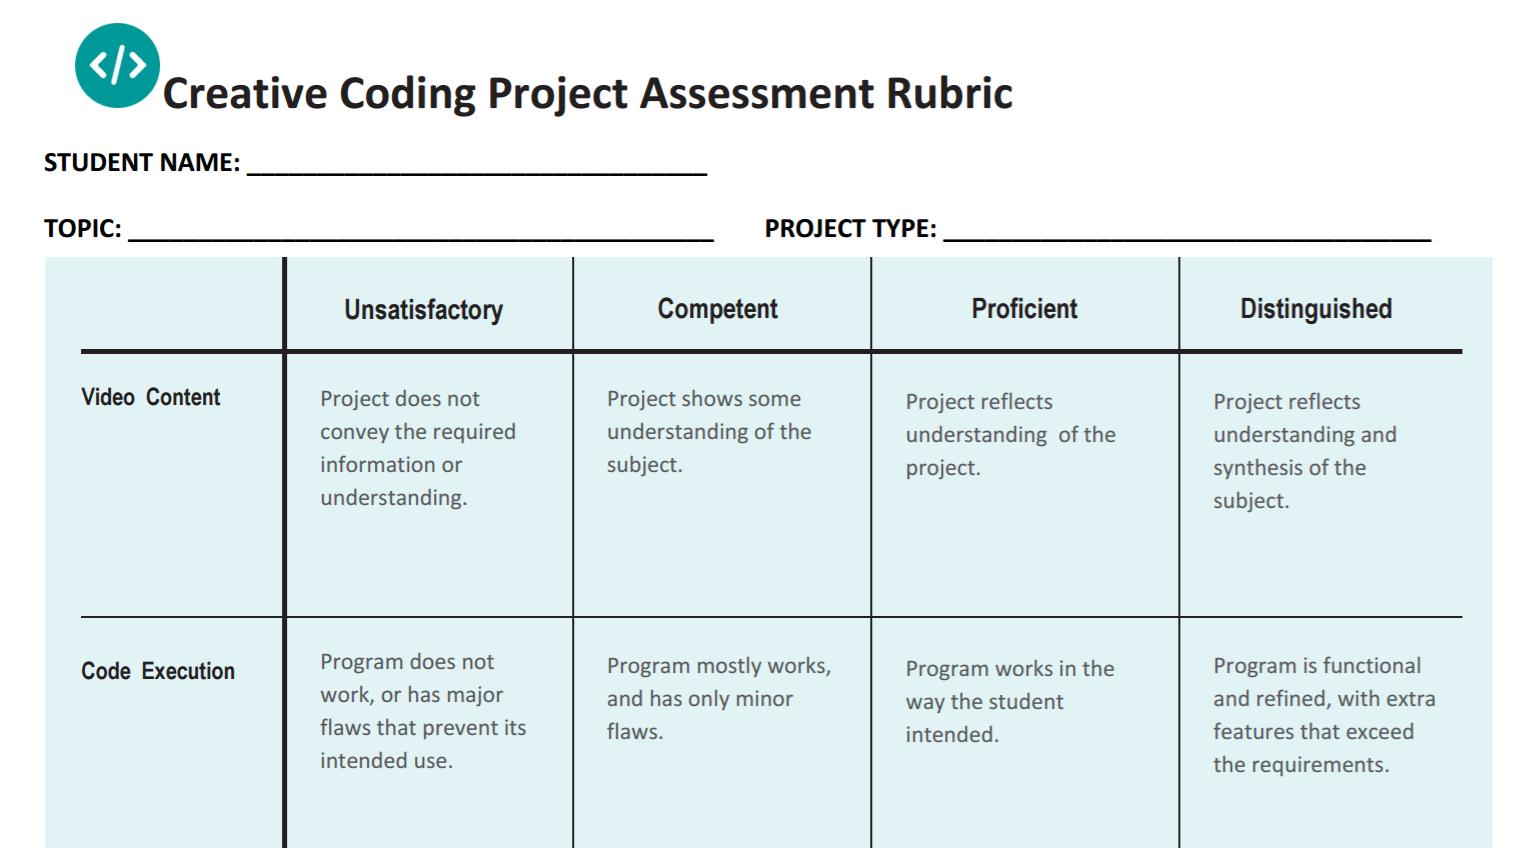 Creative Coding Assessment Rubric